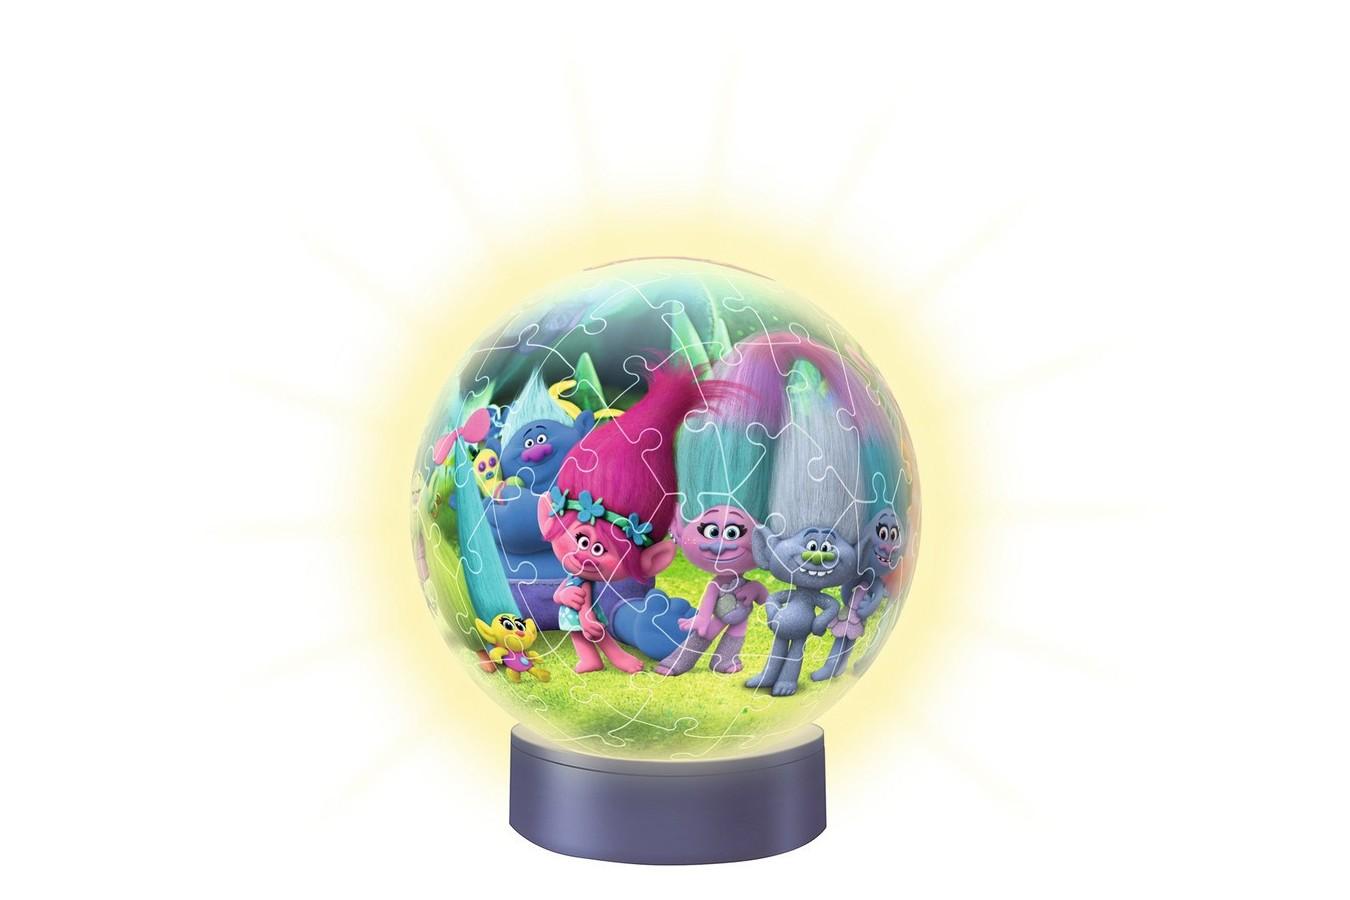 Puzzle glob Ravensburger - Luminos Trolls, 72 piese (12138)